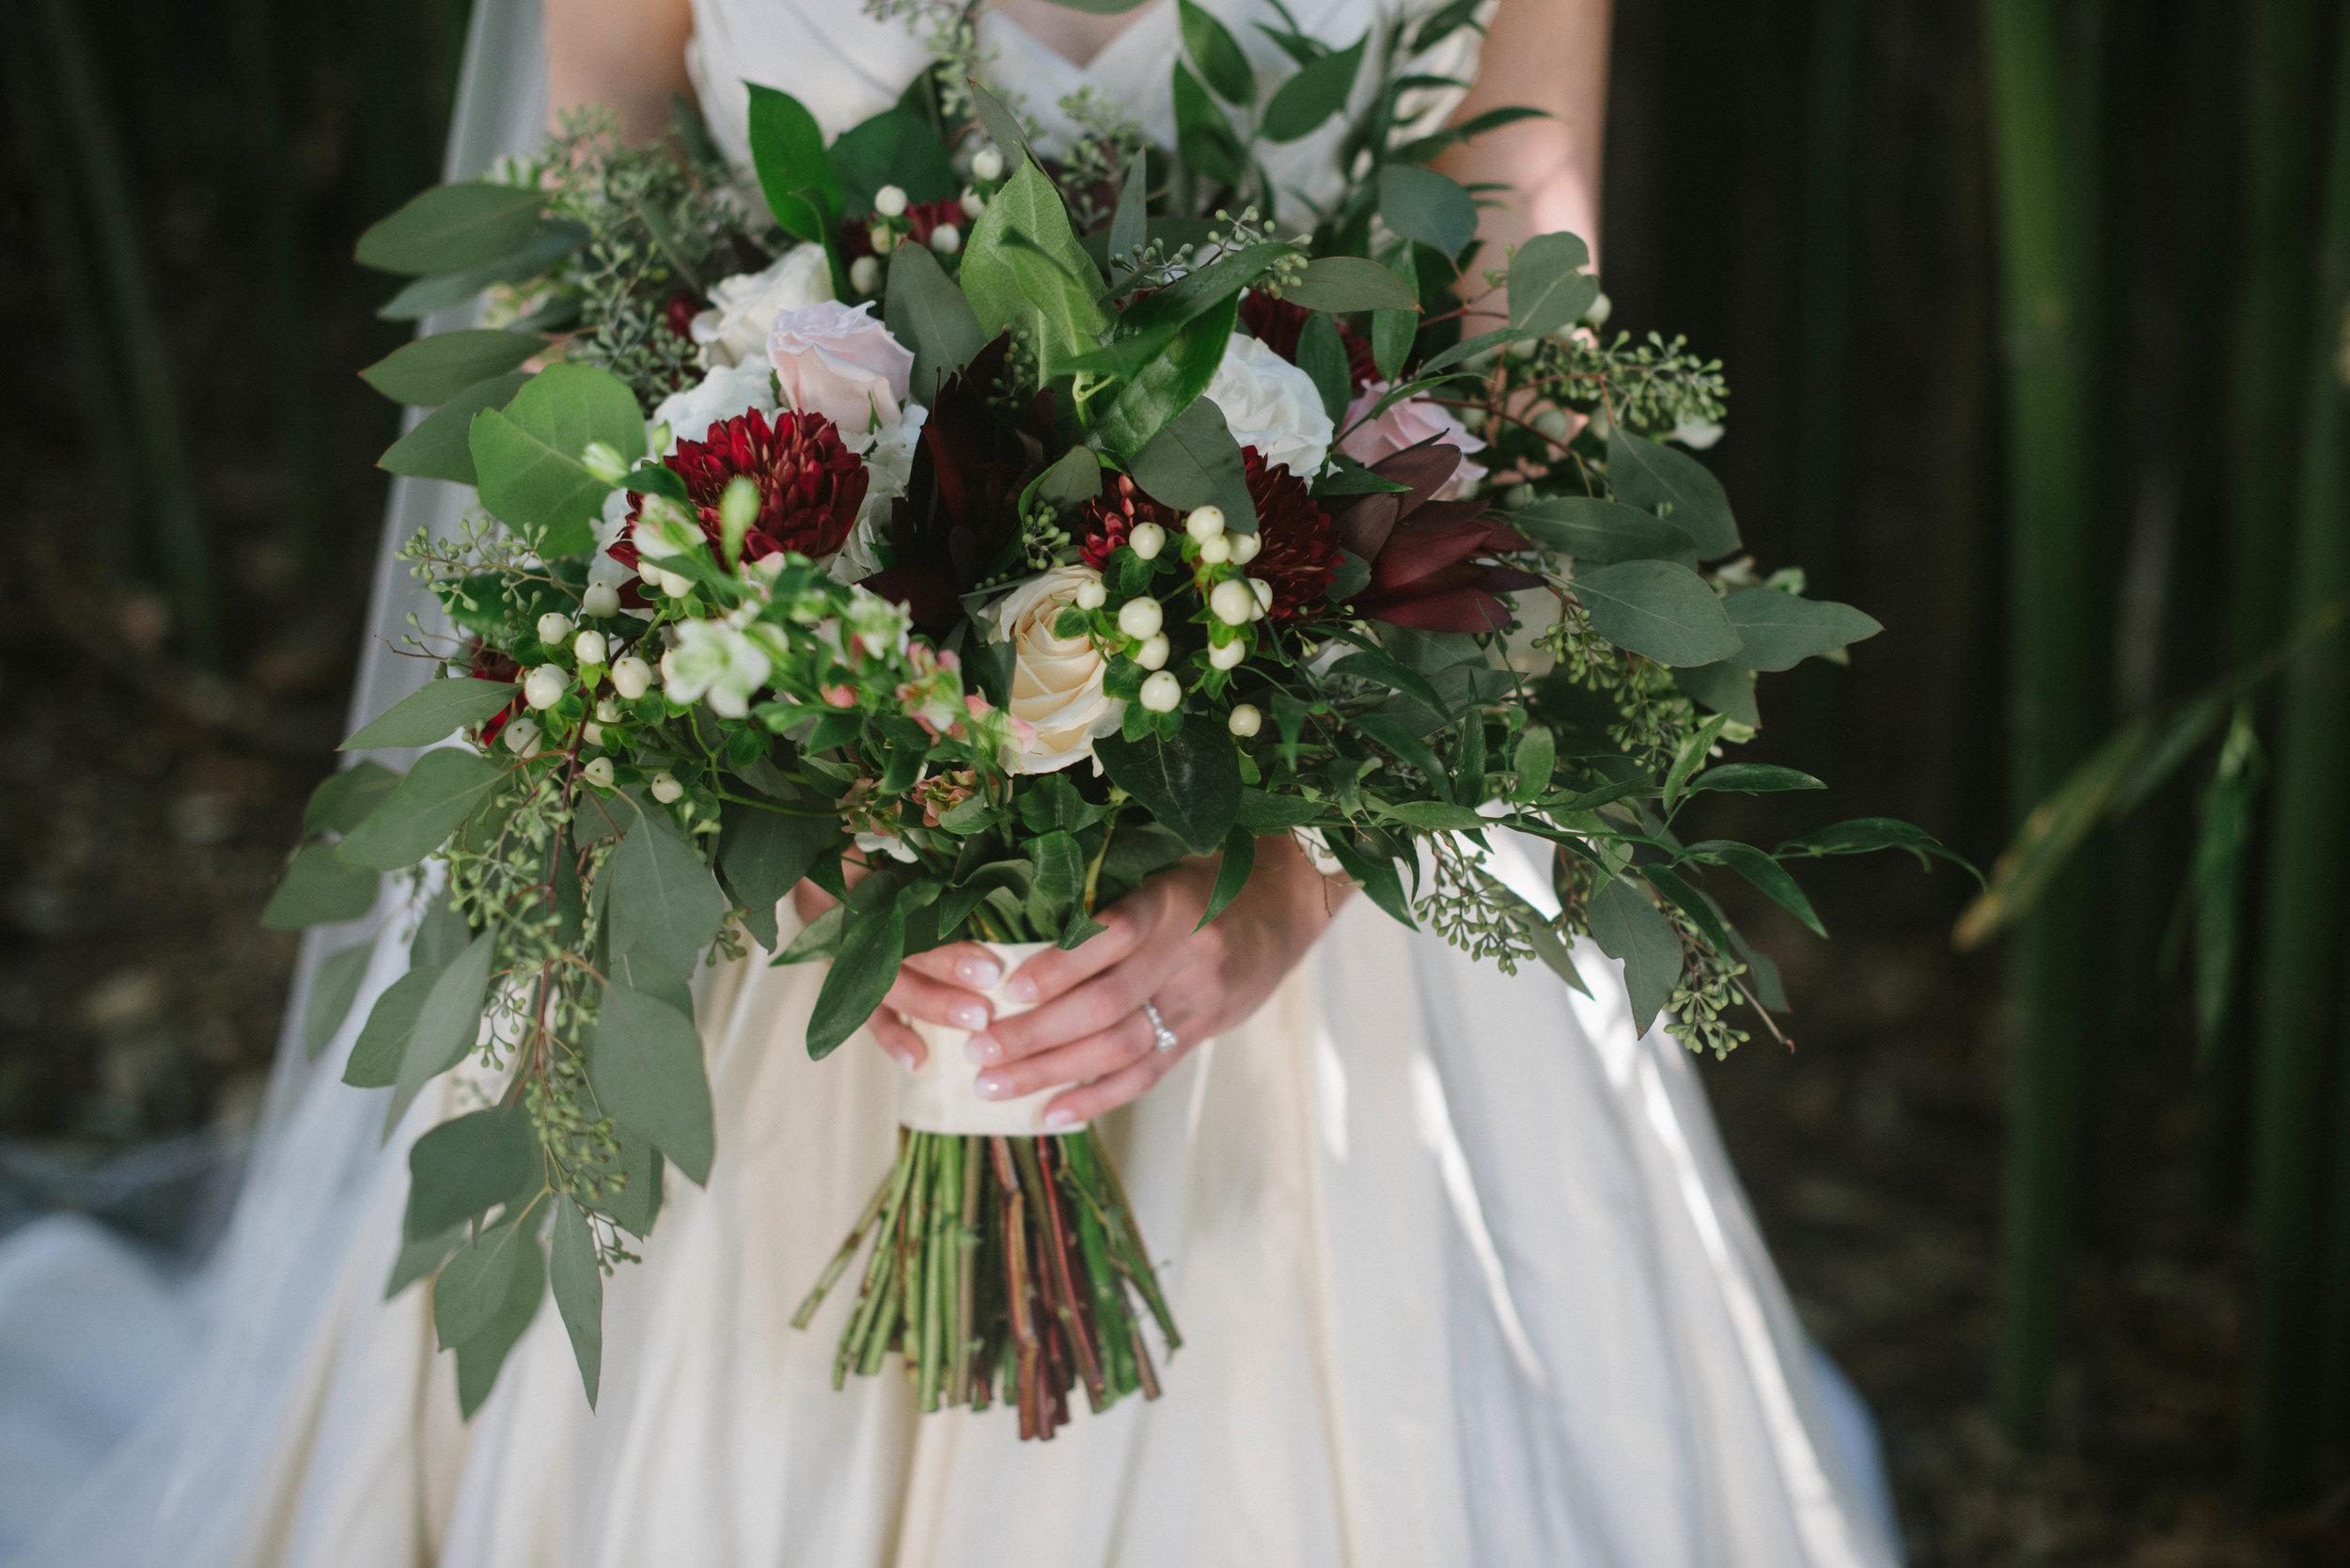 CarolineMerritt|Bridals|_Color_MiraPhotographs-108.jpg